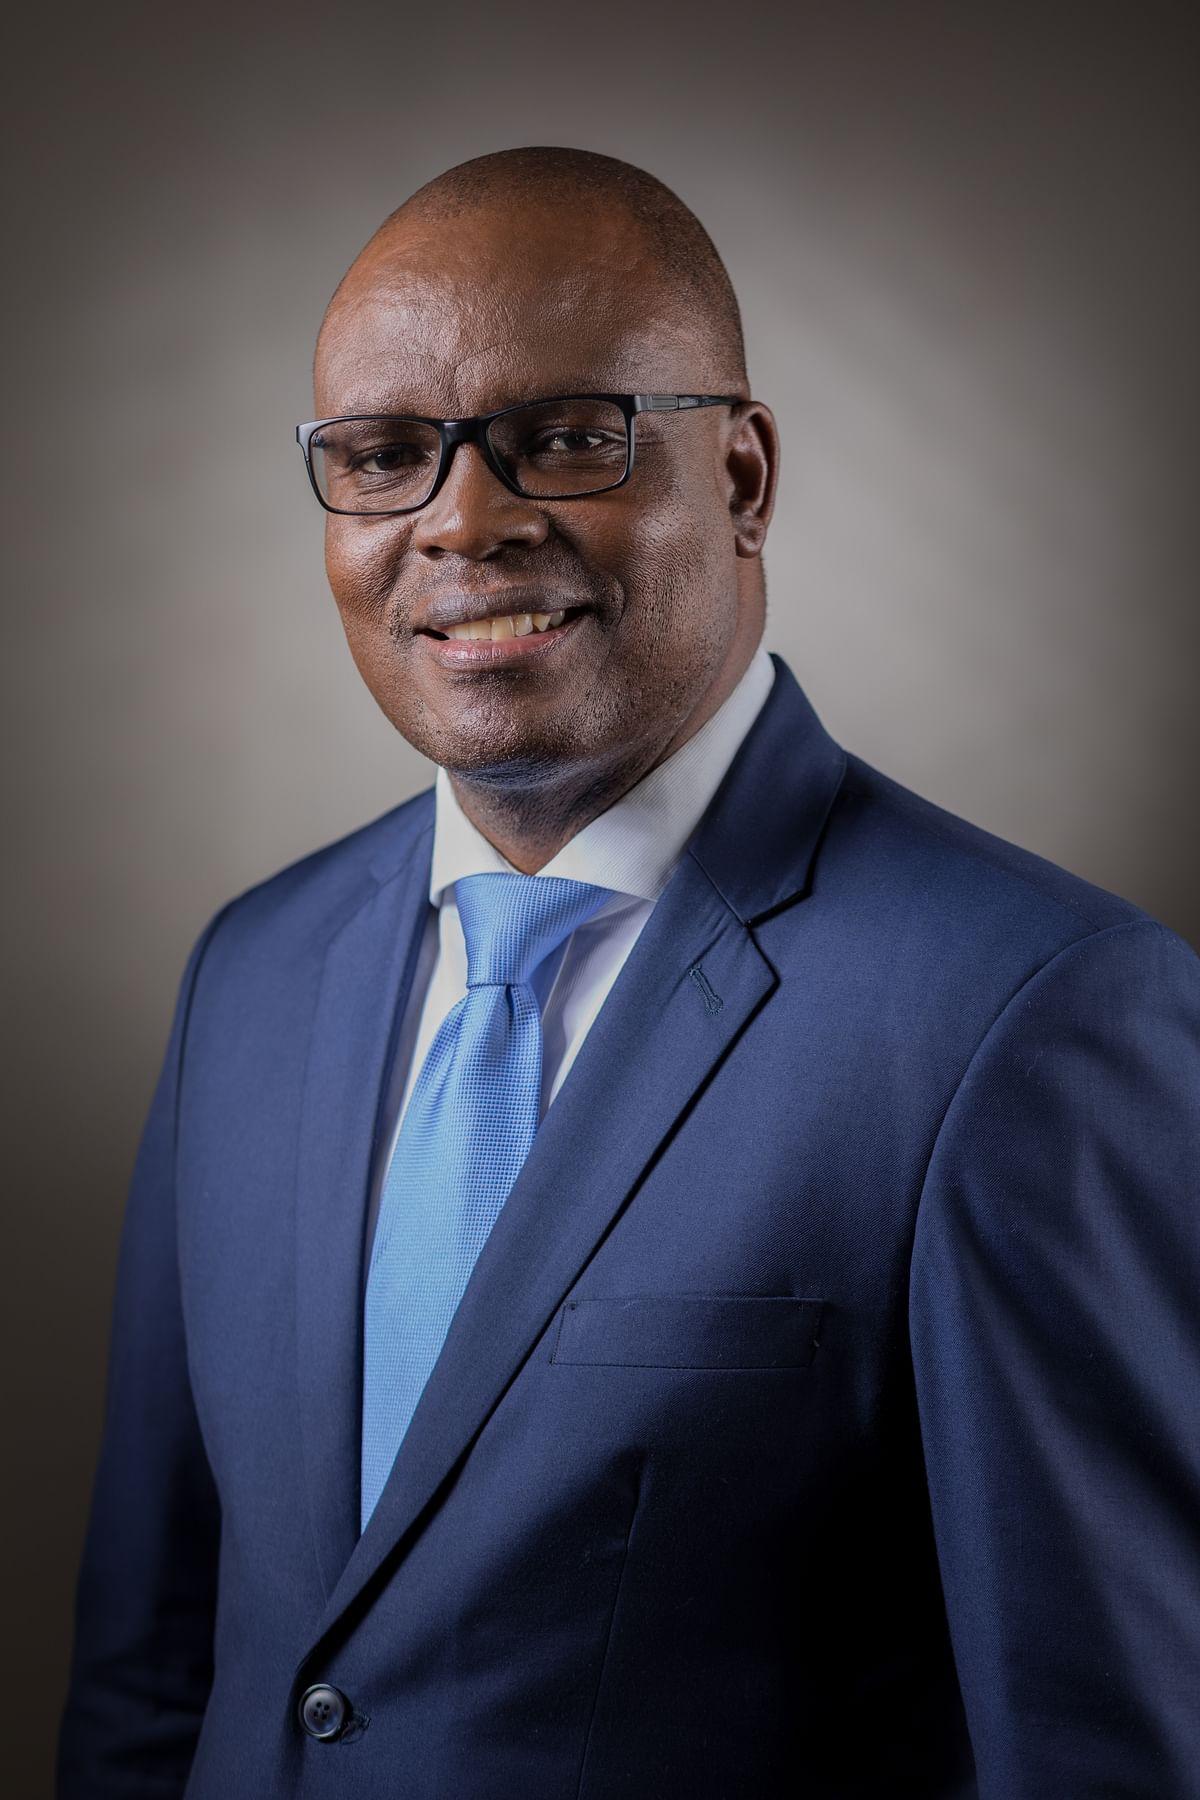 Botswana Life Insurance Limited Executive Head -  Brokers, Mr. Moletlanyi Tshosa